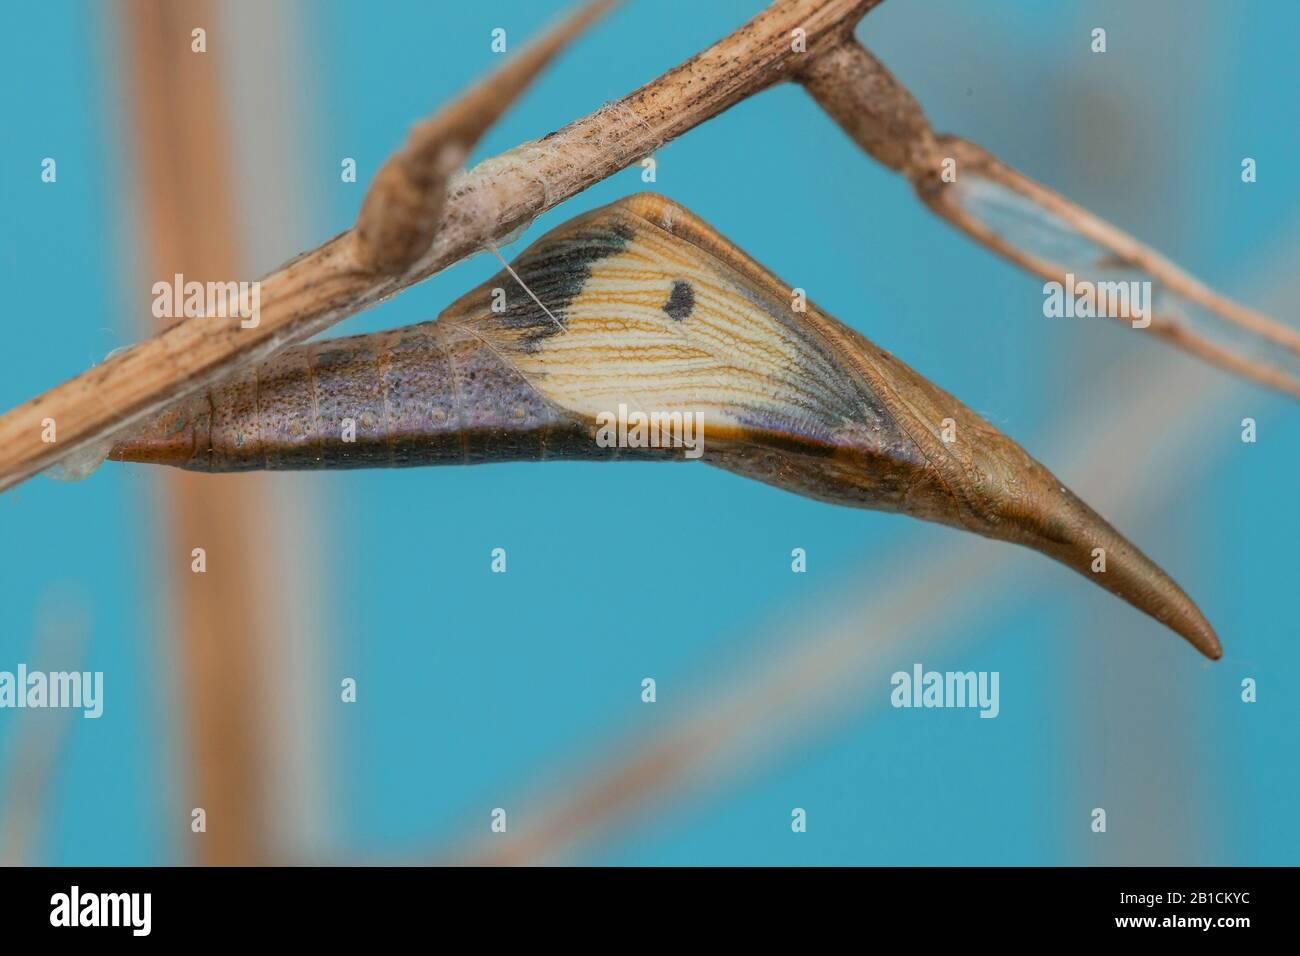 Orange-tip (Anthocharis cardamines), pupa at Alliaria petiolata, wingmaculation of a female visible, Germany, Bavaria, Niederbayern, Lower Bavaria Stock Photo